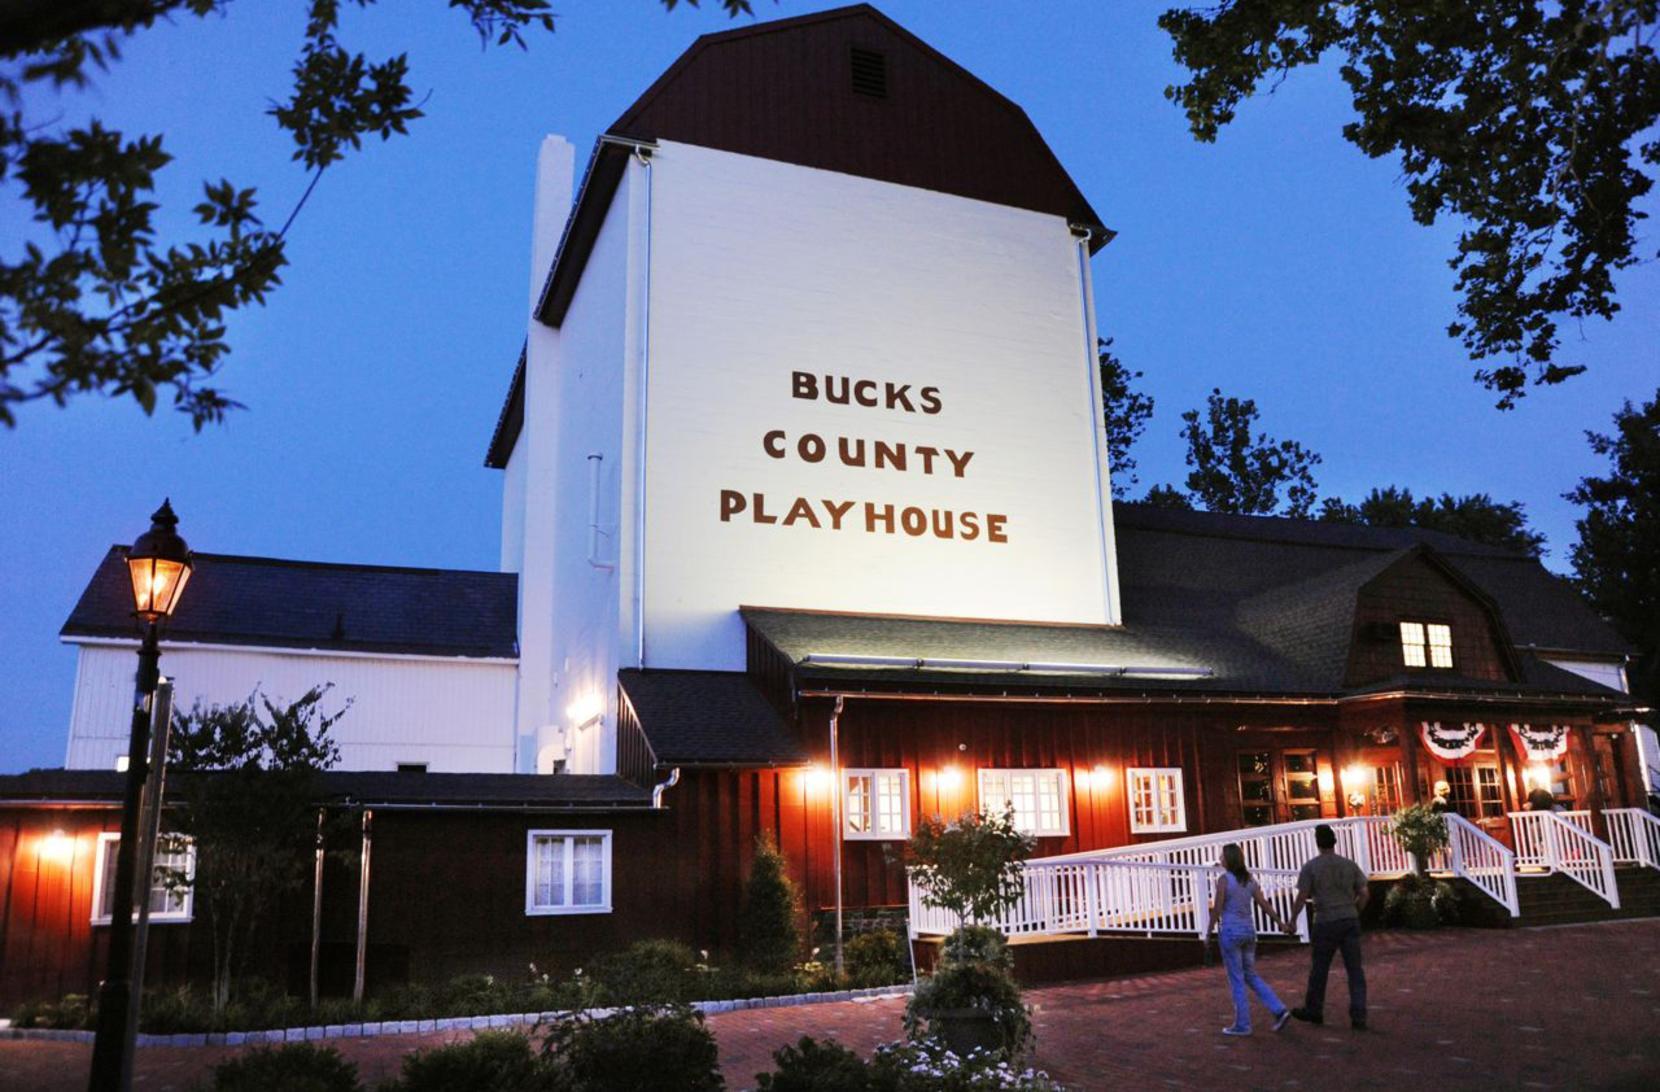 Plan a Mom's Getaway in Bucks County, Pennsylvania